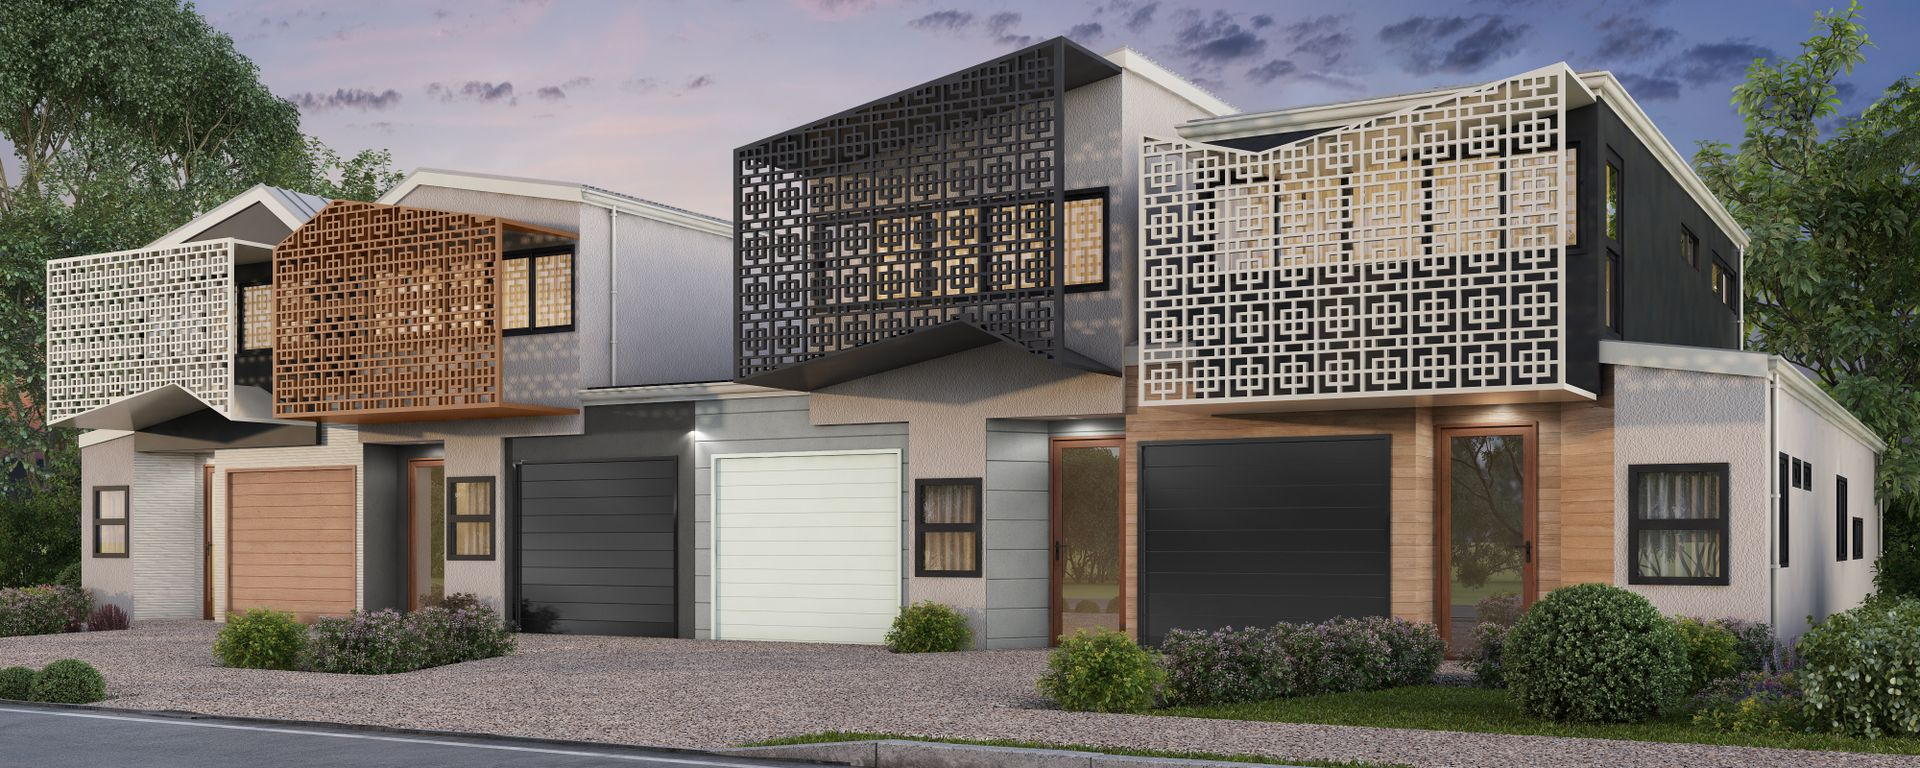 1-4/4 Besley Street, Buderim QLD 4556, Image 0